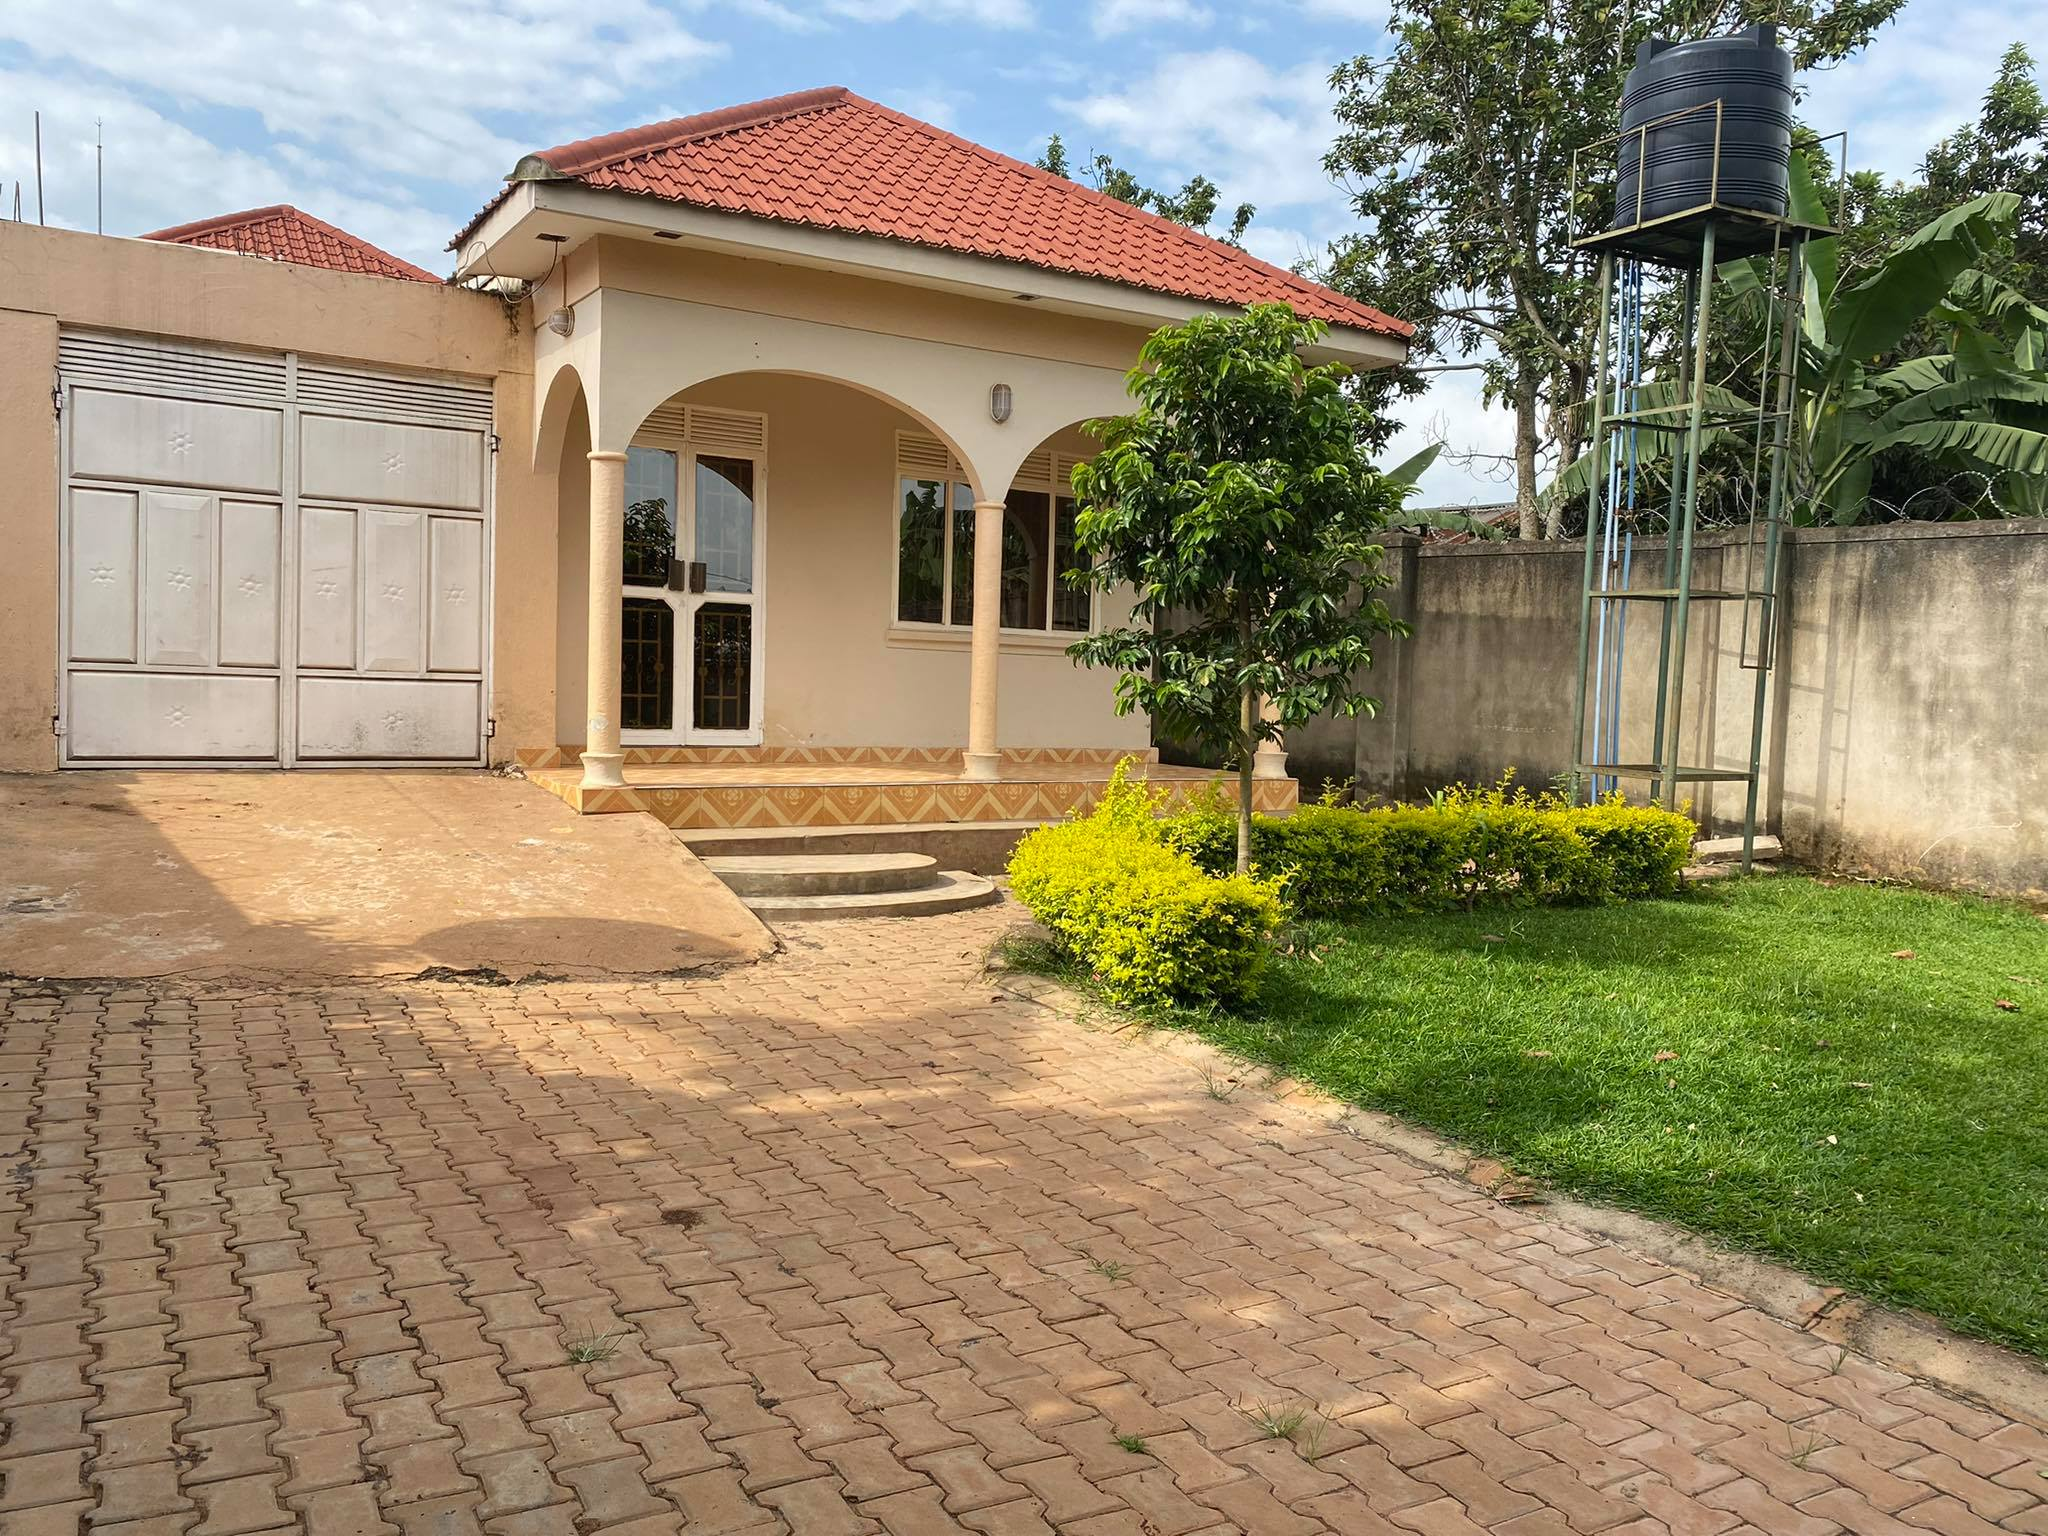 Kawuku-Bwerenga   WPS231